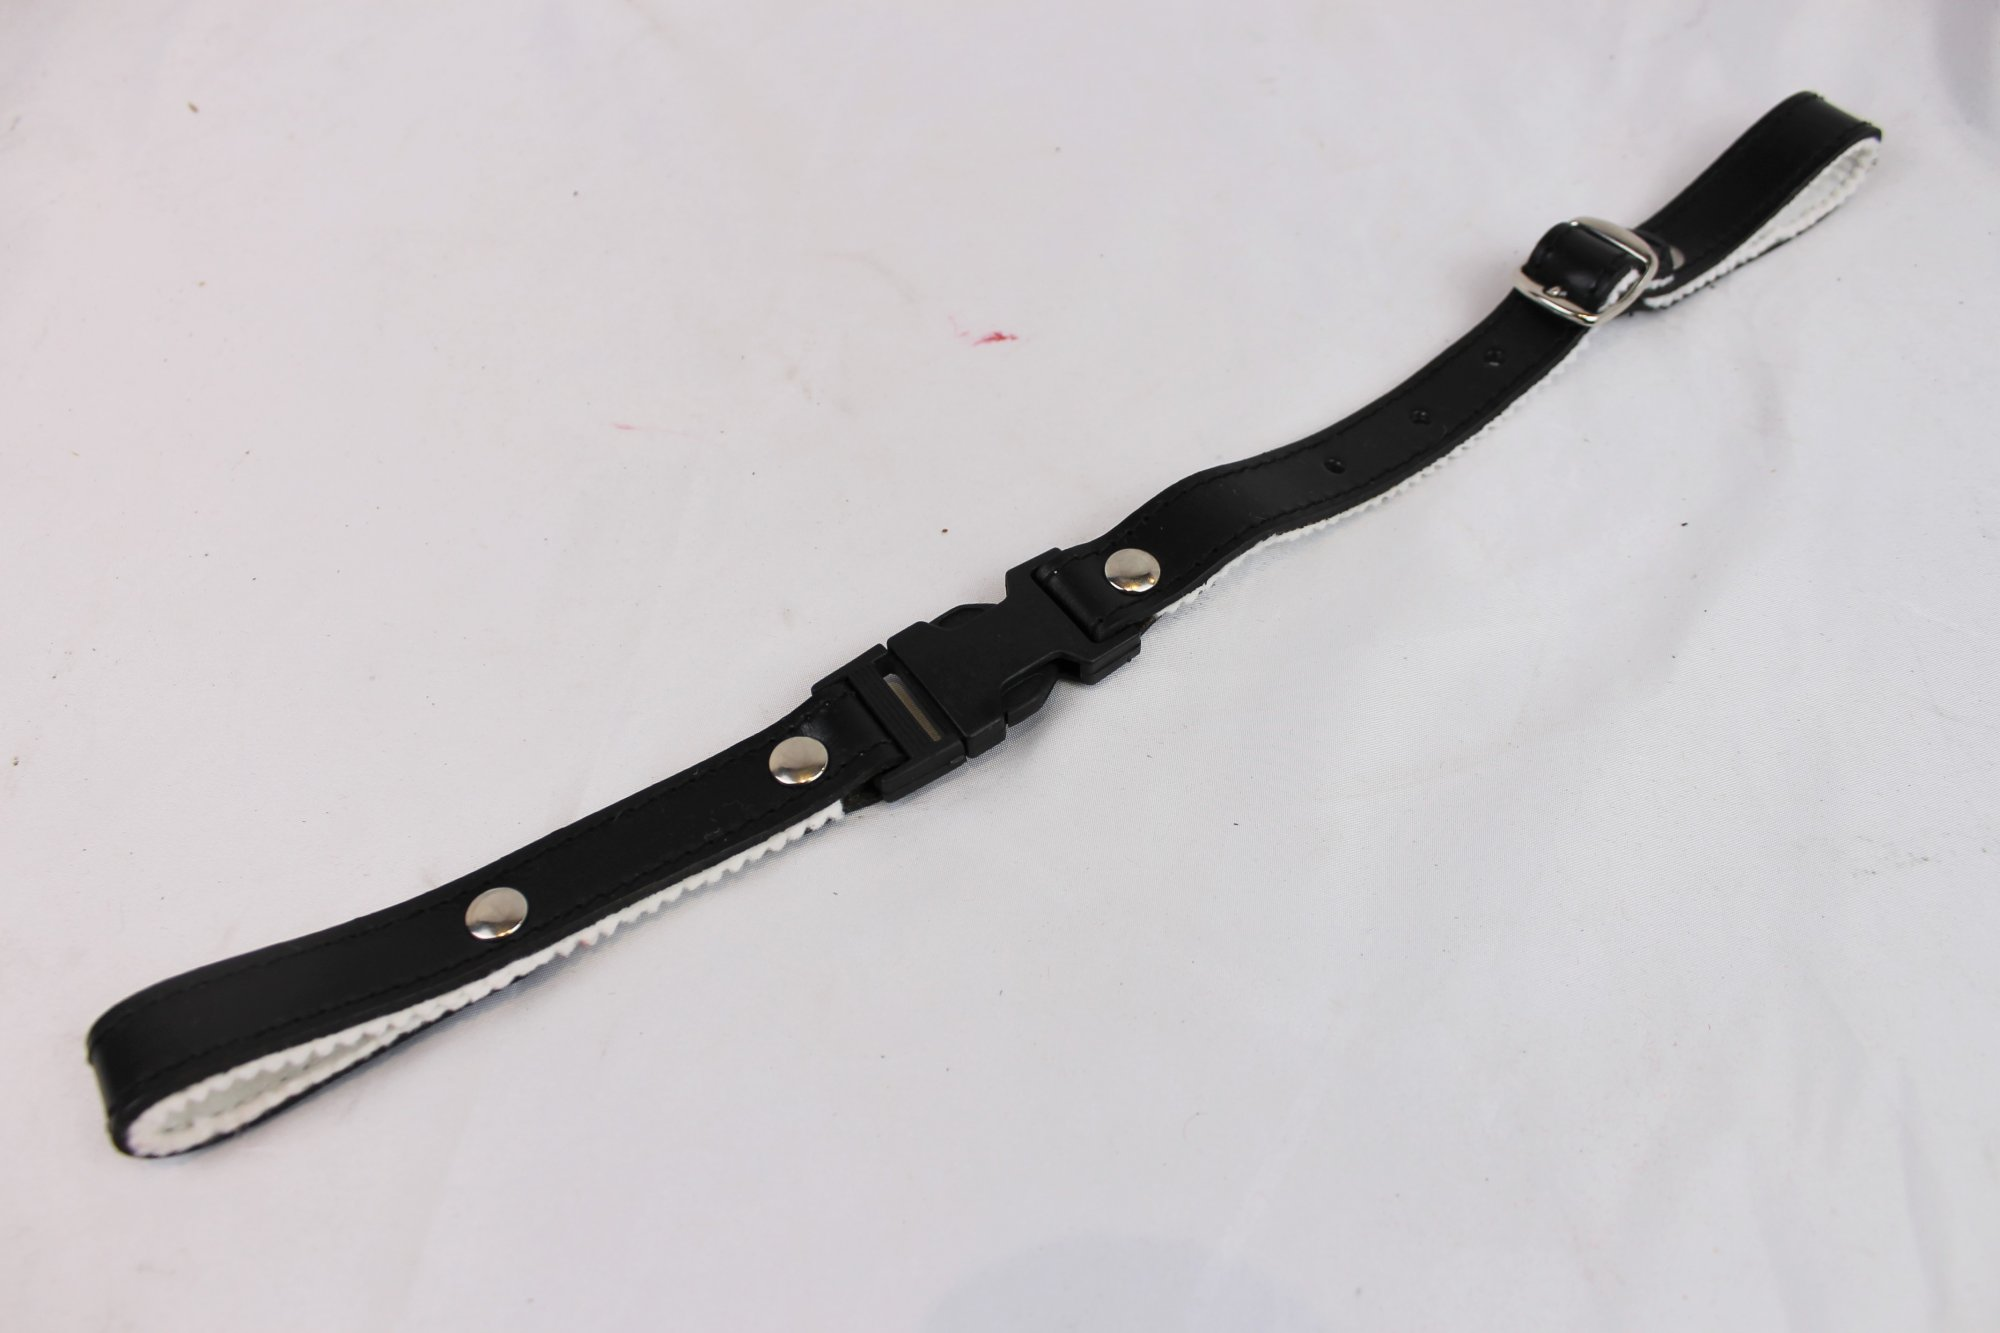 NEW Black Fuselli White Felt Lined Leather Back Strap  - Adjustable 14 to 16.5